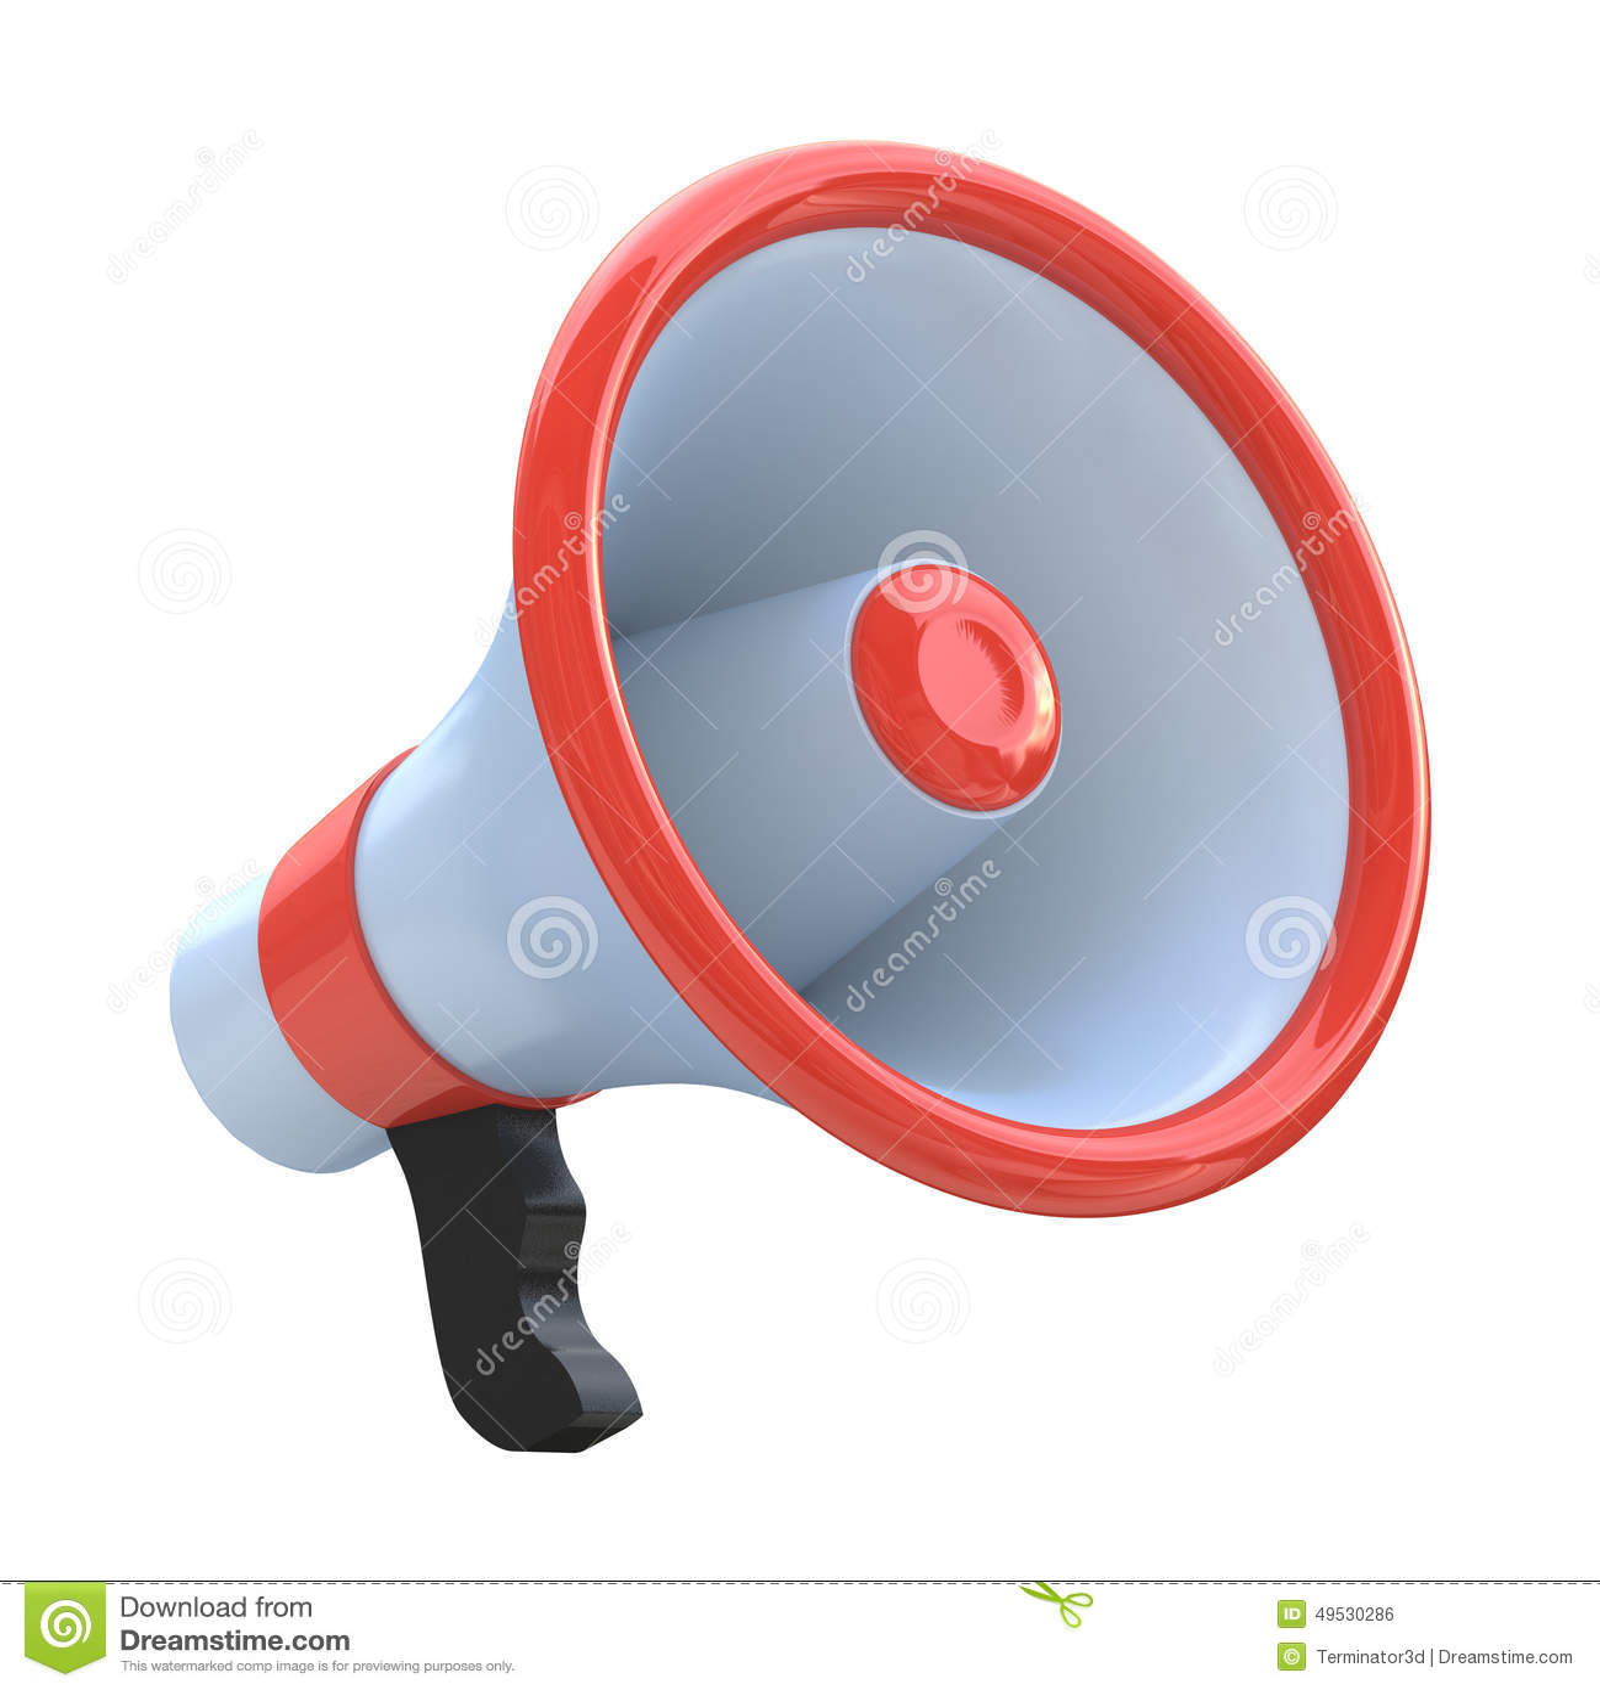 m gaphone ou haut parleur rouge illustration stock image 49530286. Black Bedroom Furniture Sets. Home Design Ideas